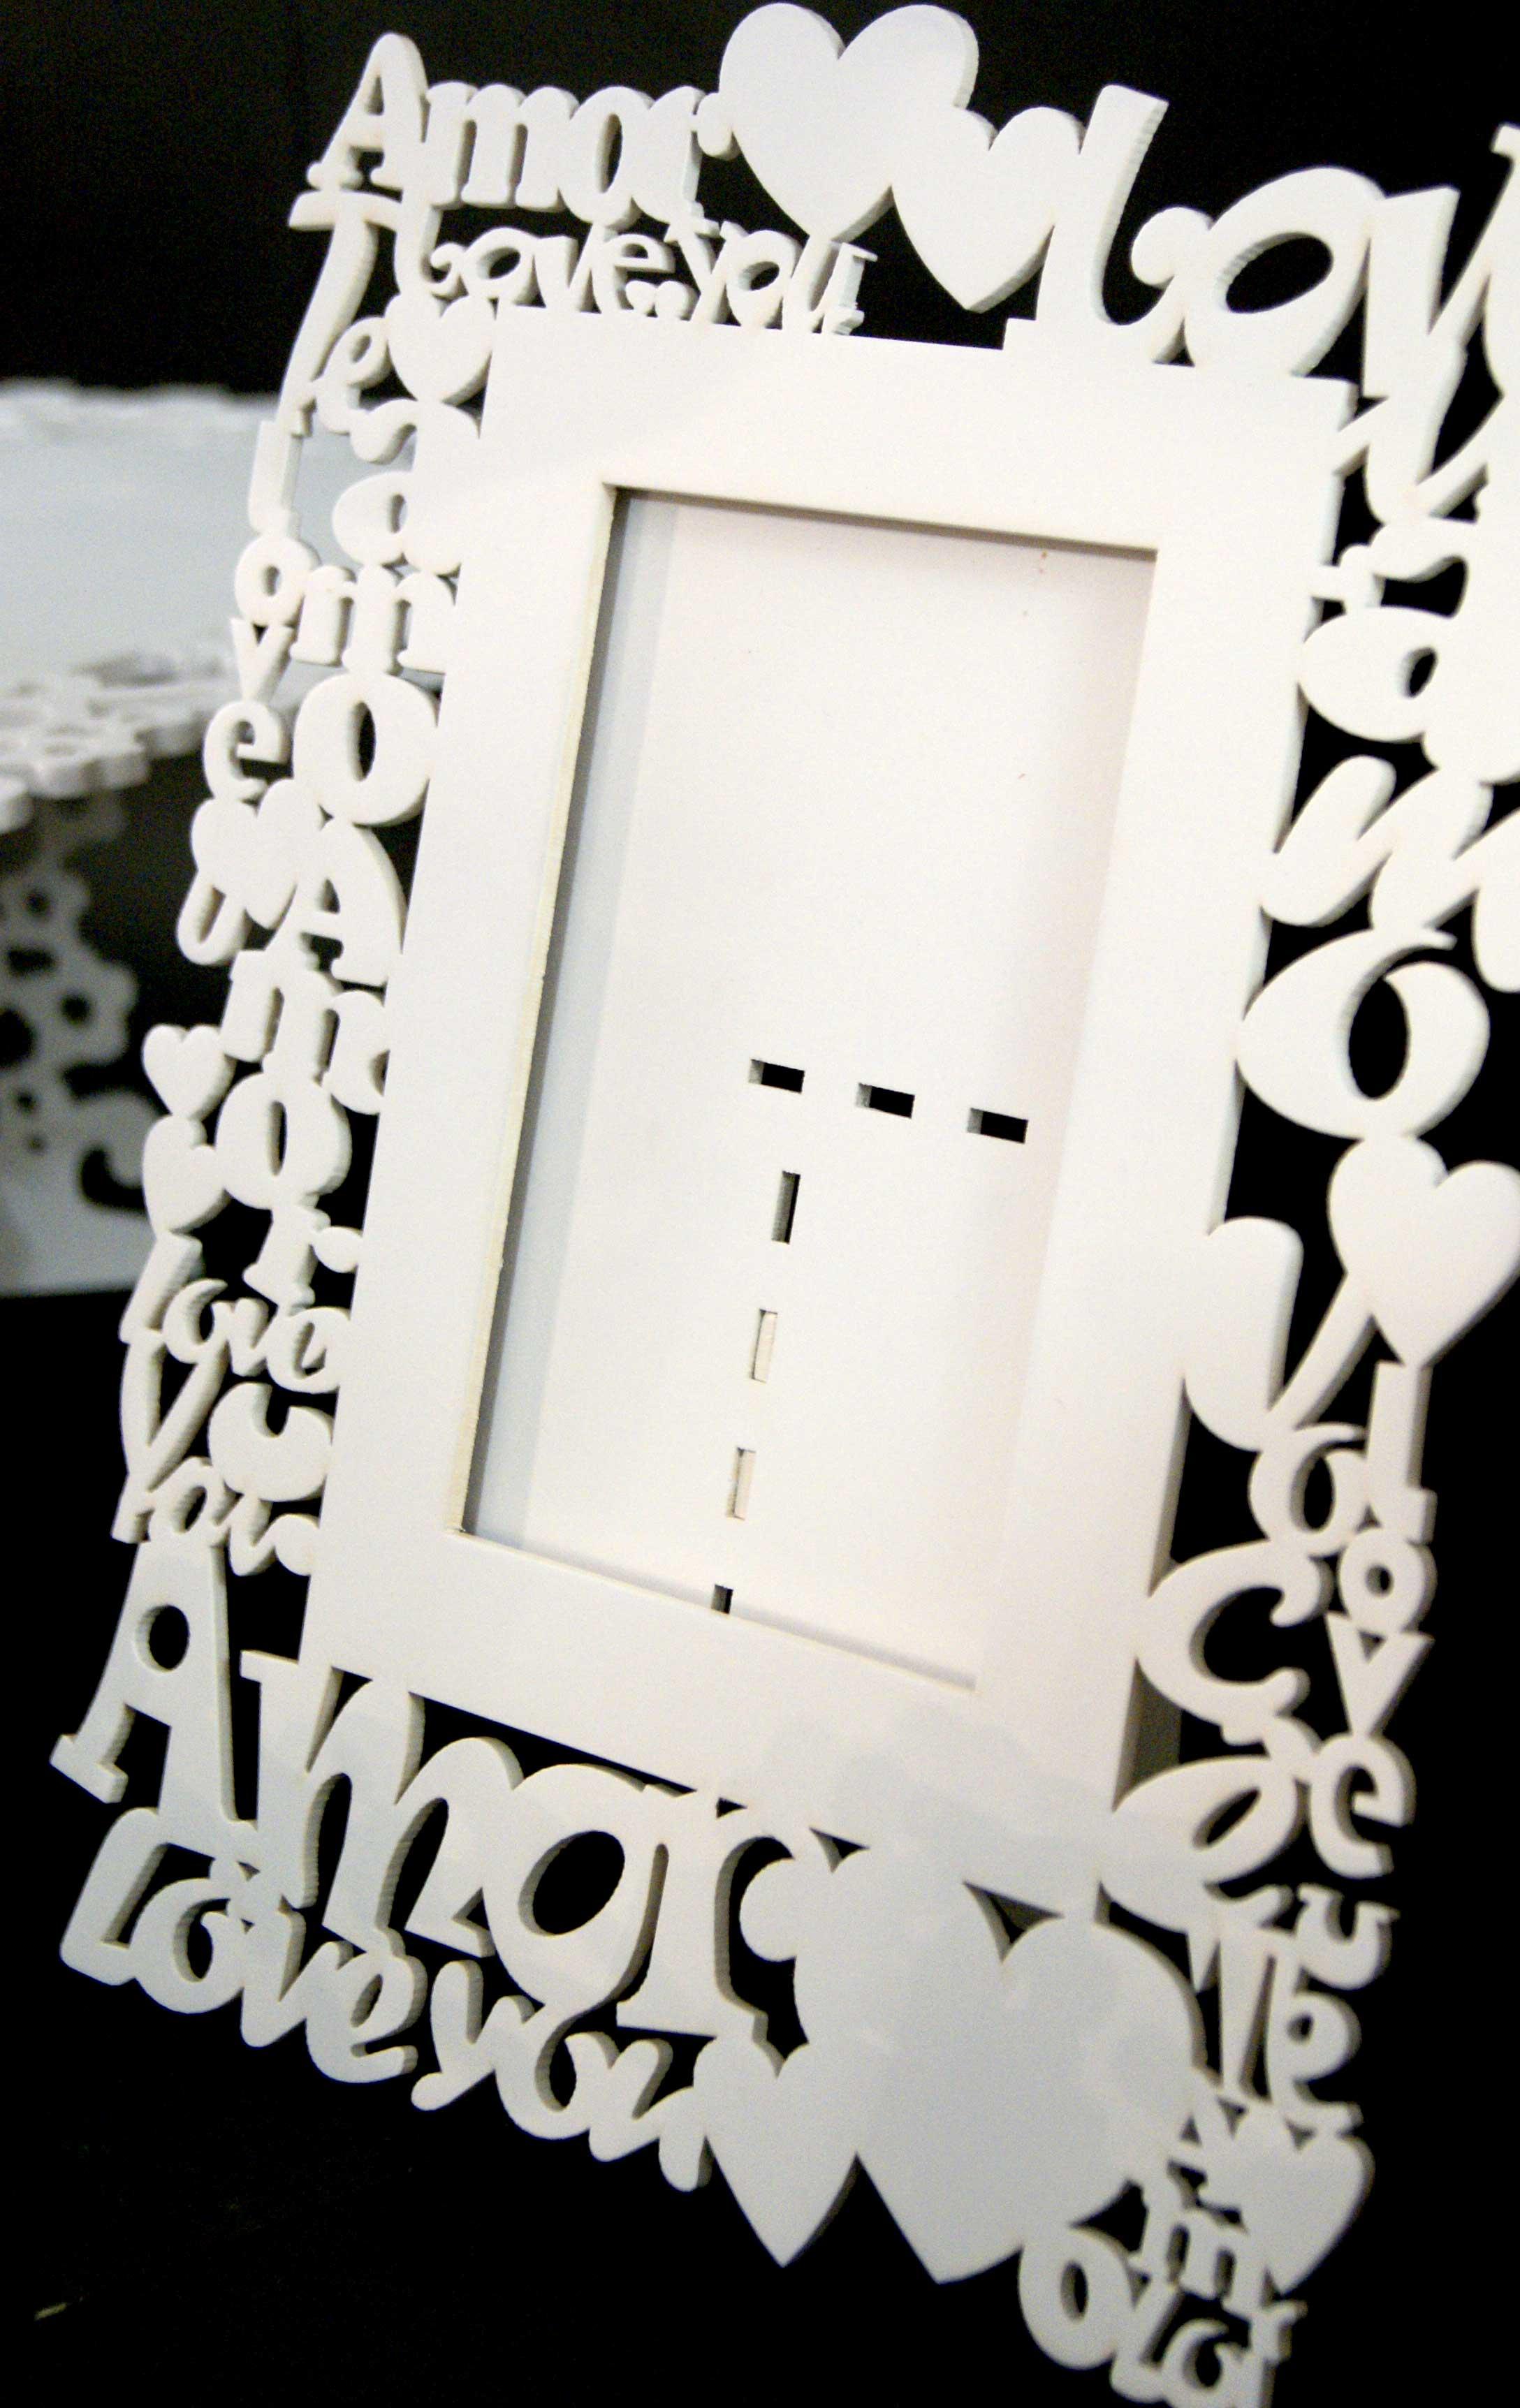 kit decoracao casamento:Kit Decoração Casamento , Noivado Kit Decoração Casamento